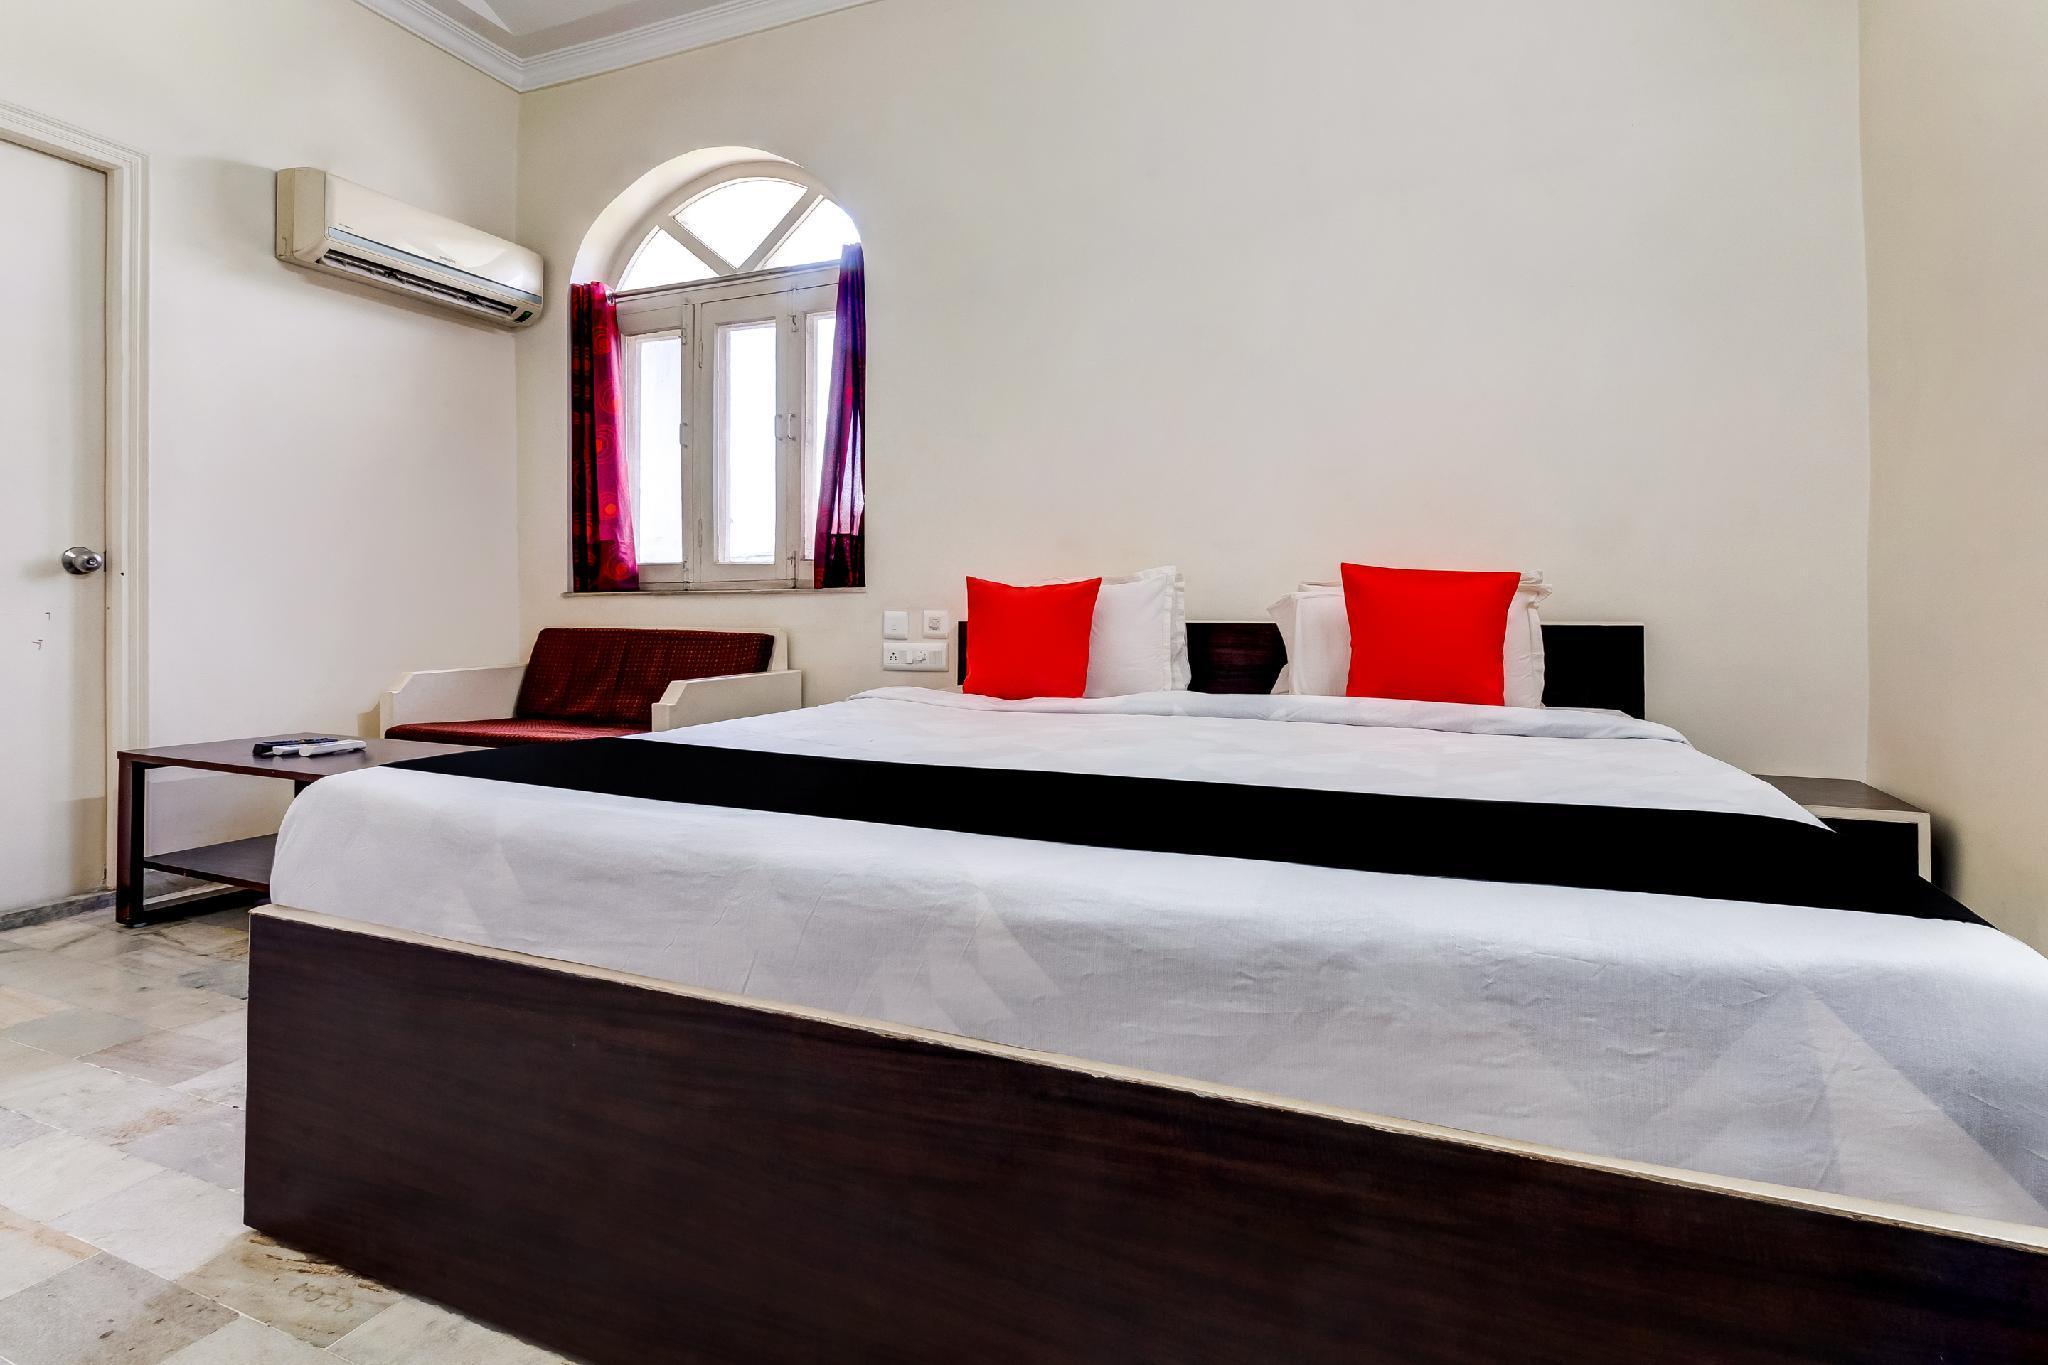 Capital O 60569 Hotel Royal Maithan International